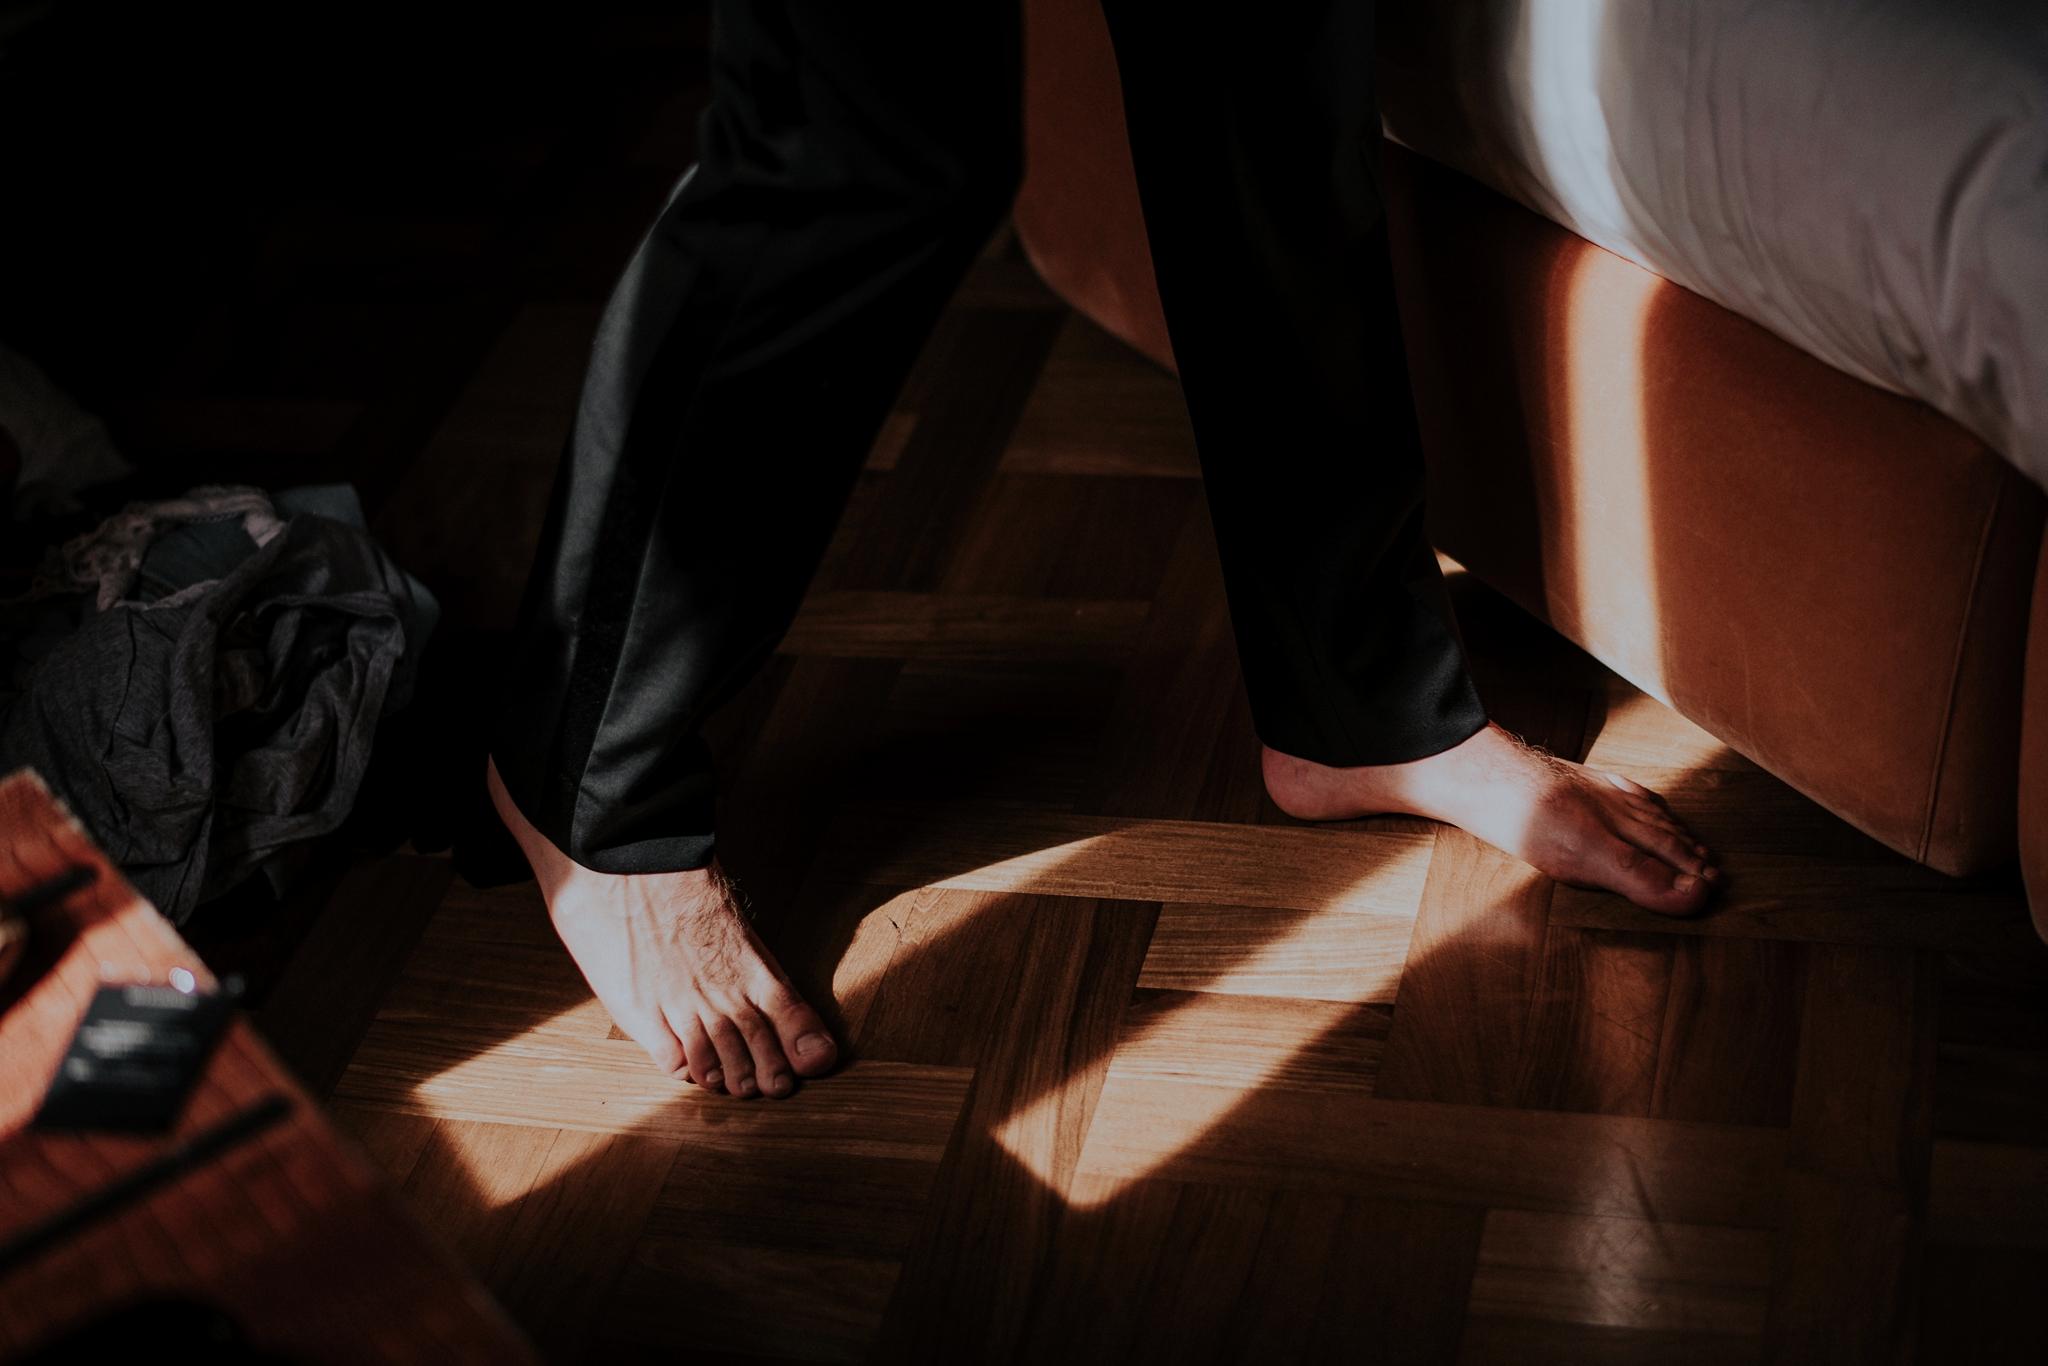 destination-austin-wedding-photographer-italy-florence439.JPG